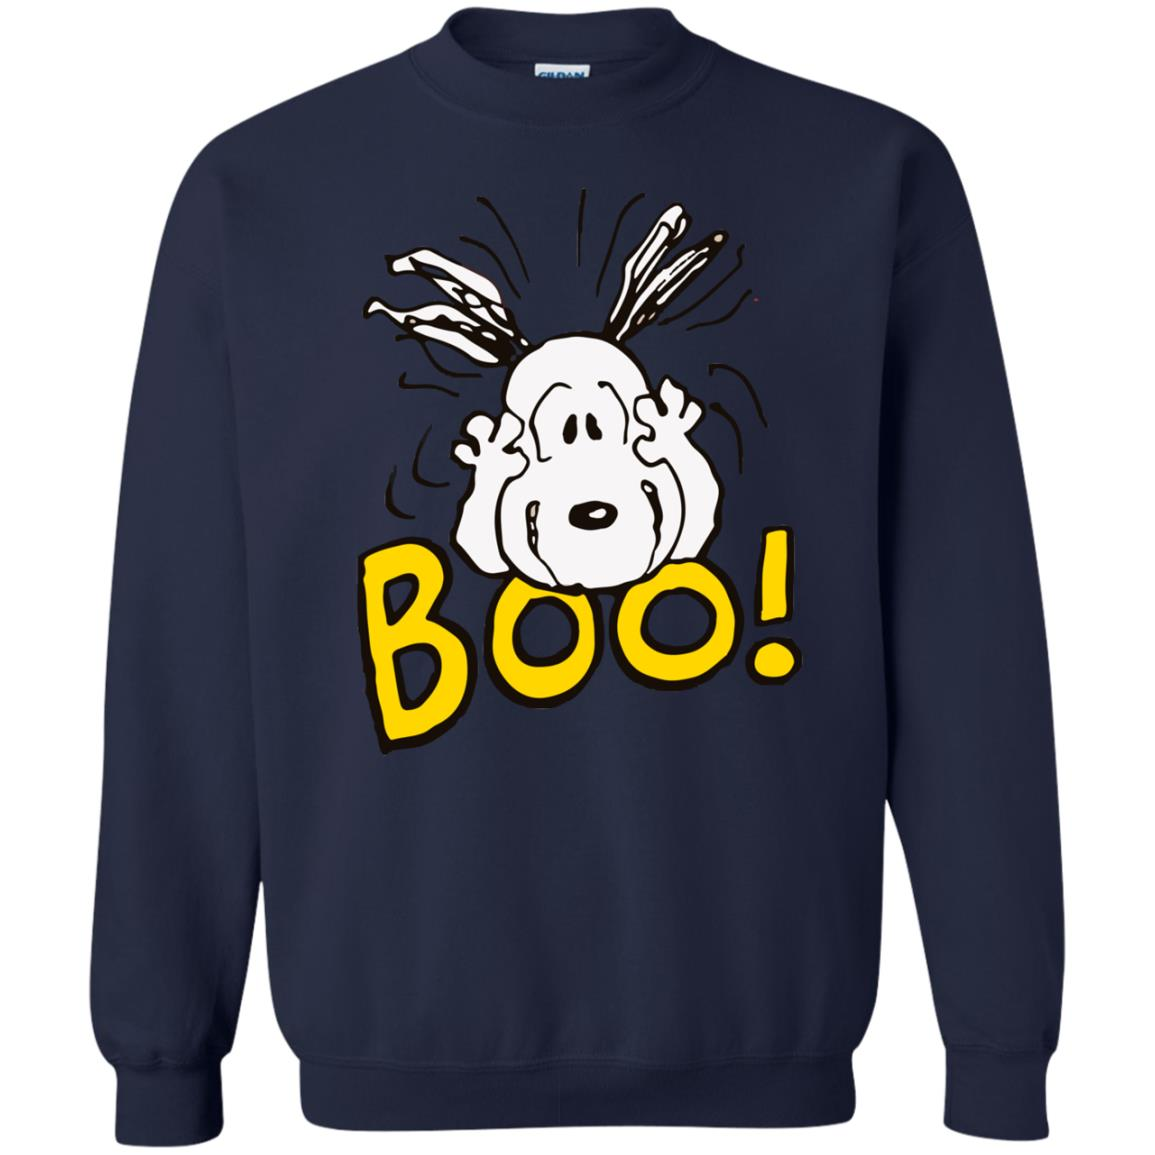 image 2233 - Peanuts Snoopy Halloween Boo shirt, hoodie, tank